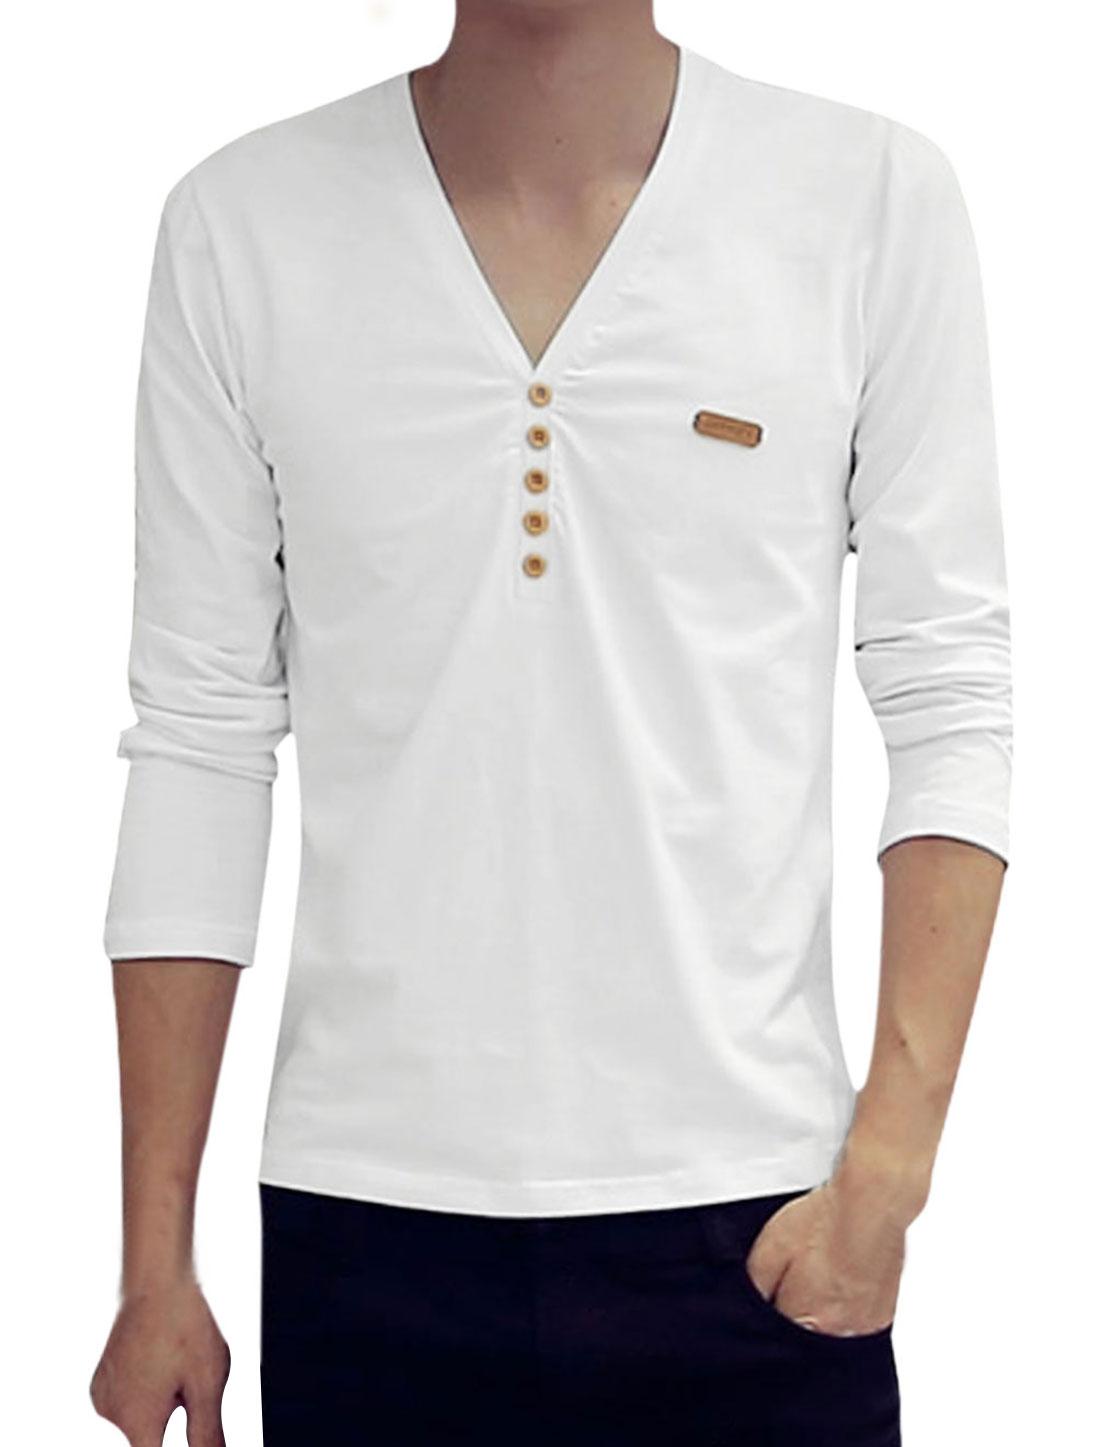 Men V Neck Long Sleeves Buttons Embellished Tee Shirt White S